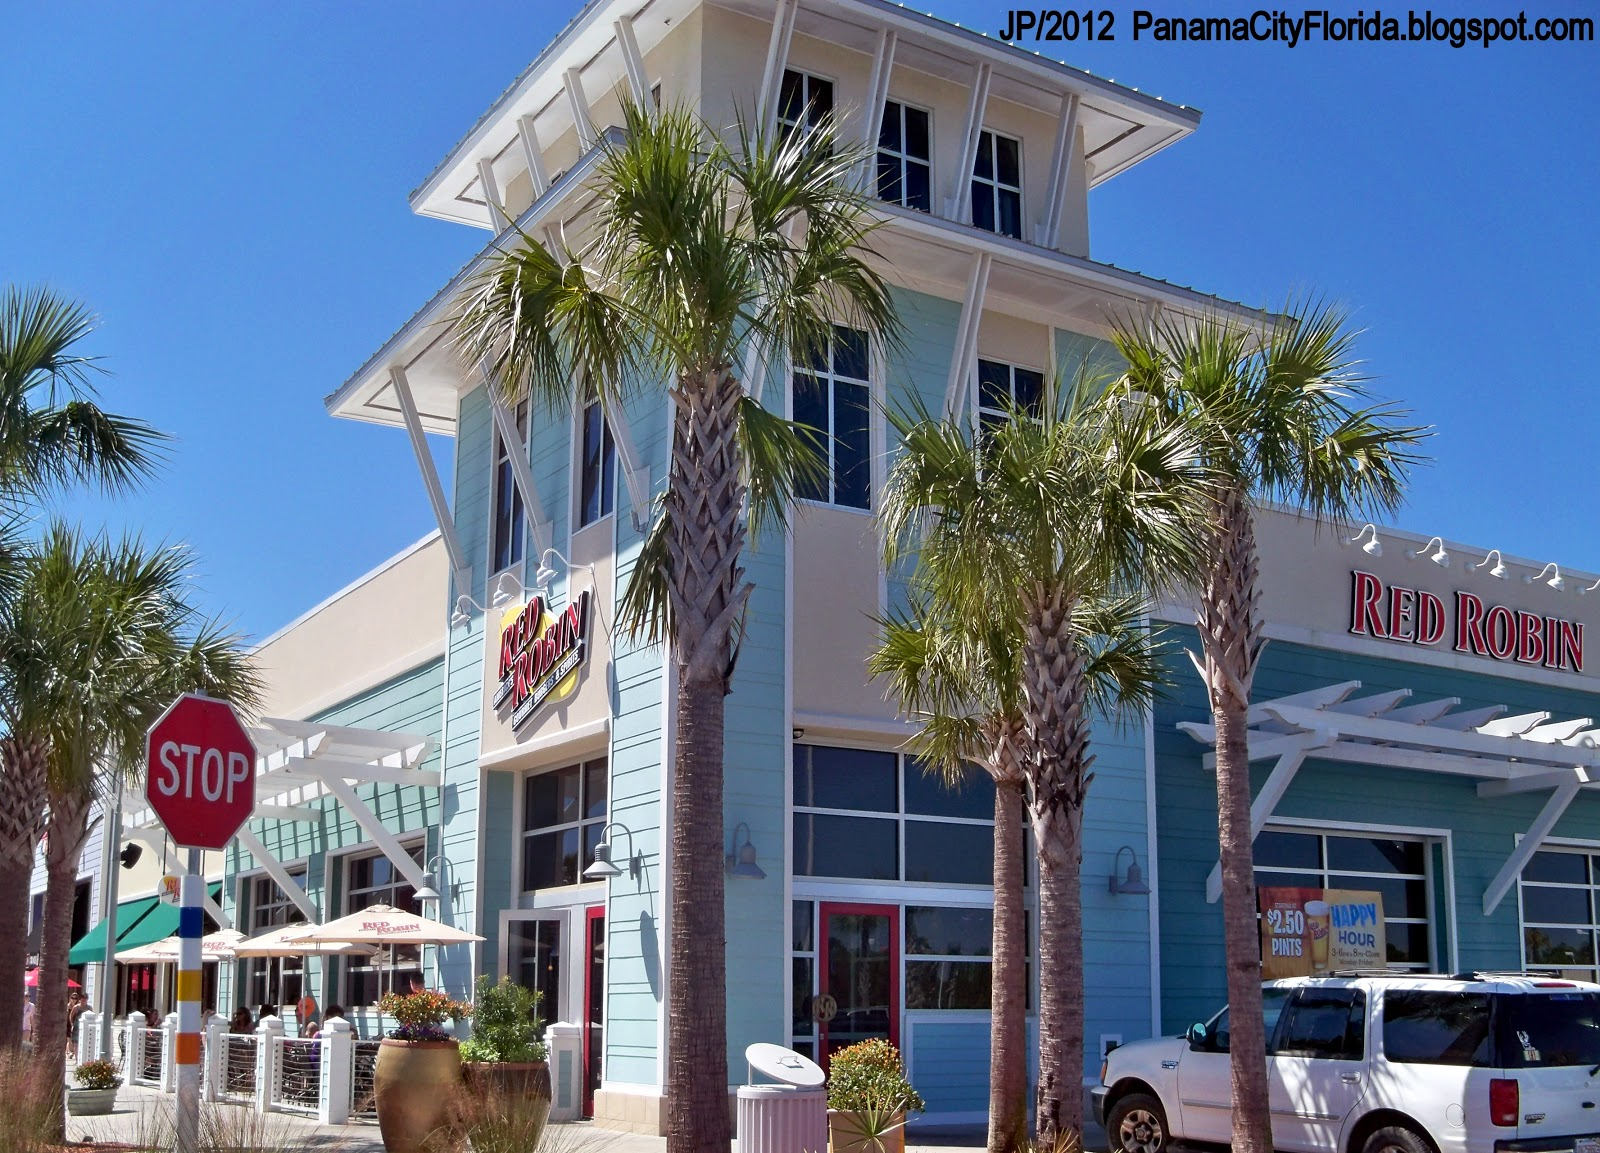 Red Robin Panama City Beach Fl